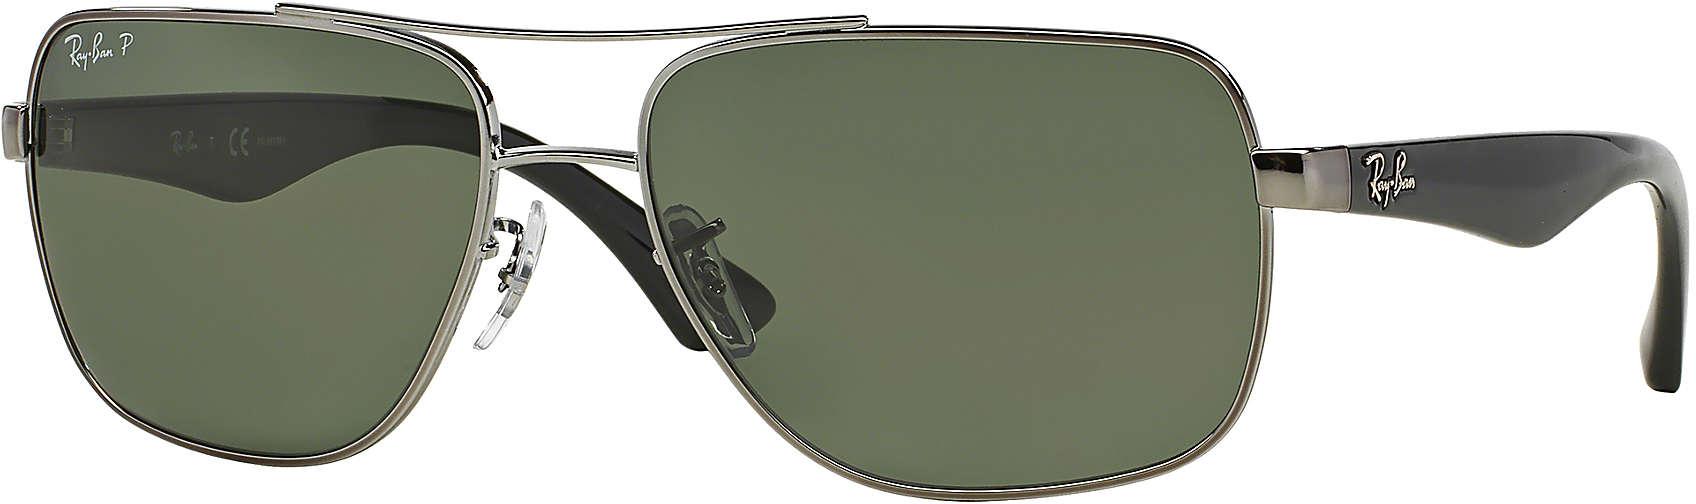 1fdc22fda1 Ray-Ban Men s RB3483 Sunglasses